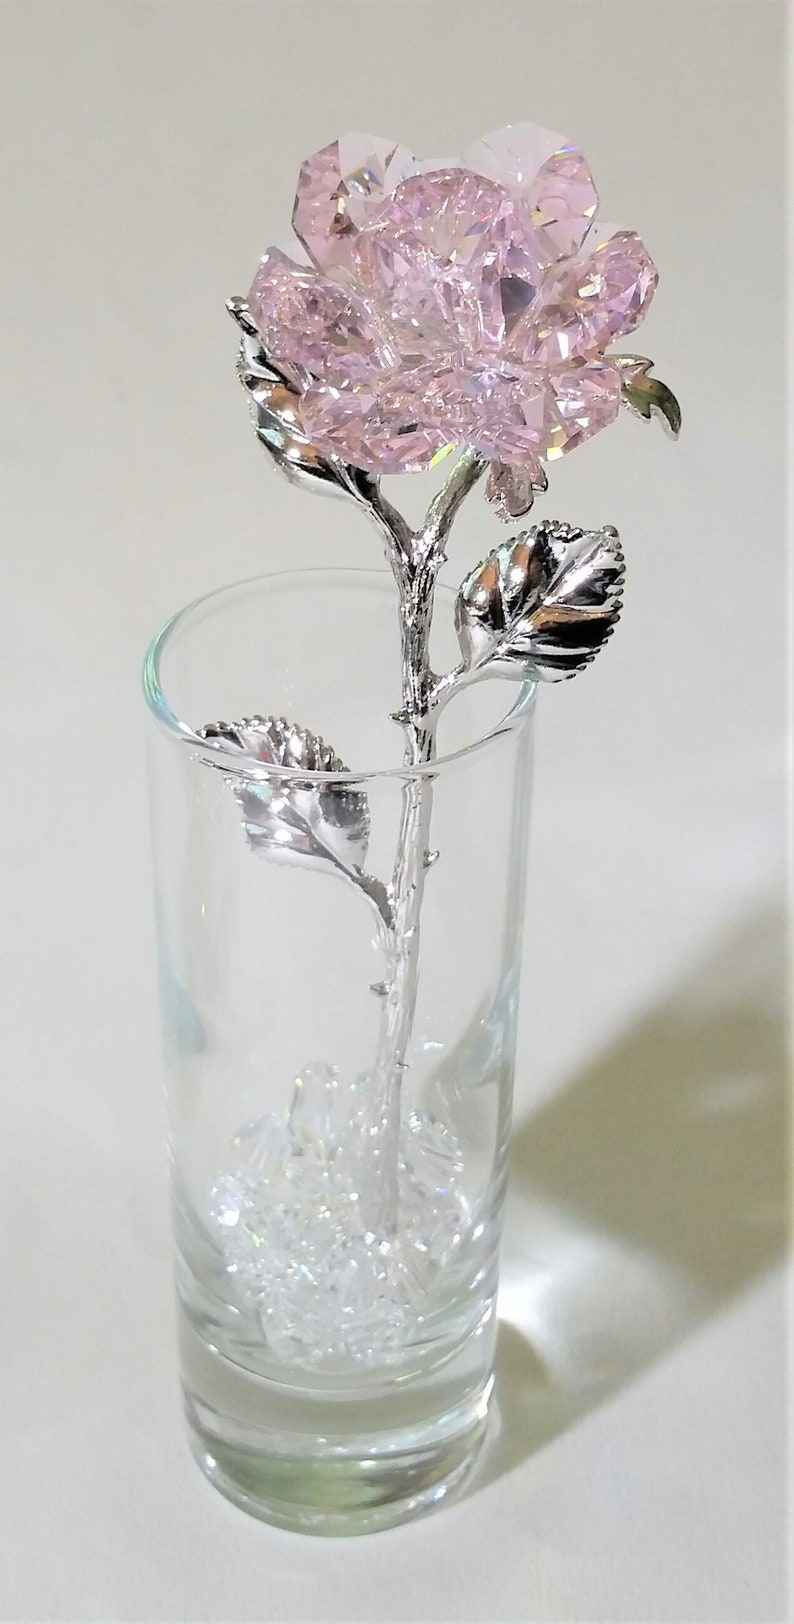 bd5b0b29ebd Pink Crystal Rose Mase With Swarovski Crystal In Mini Vase | Etsy